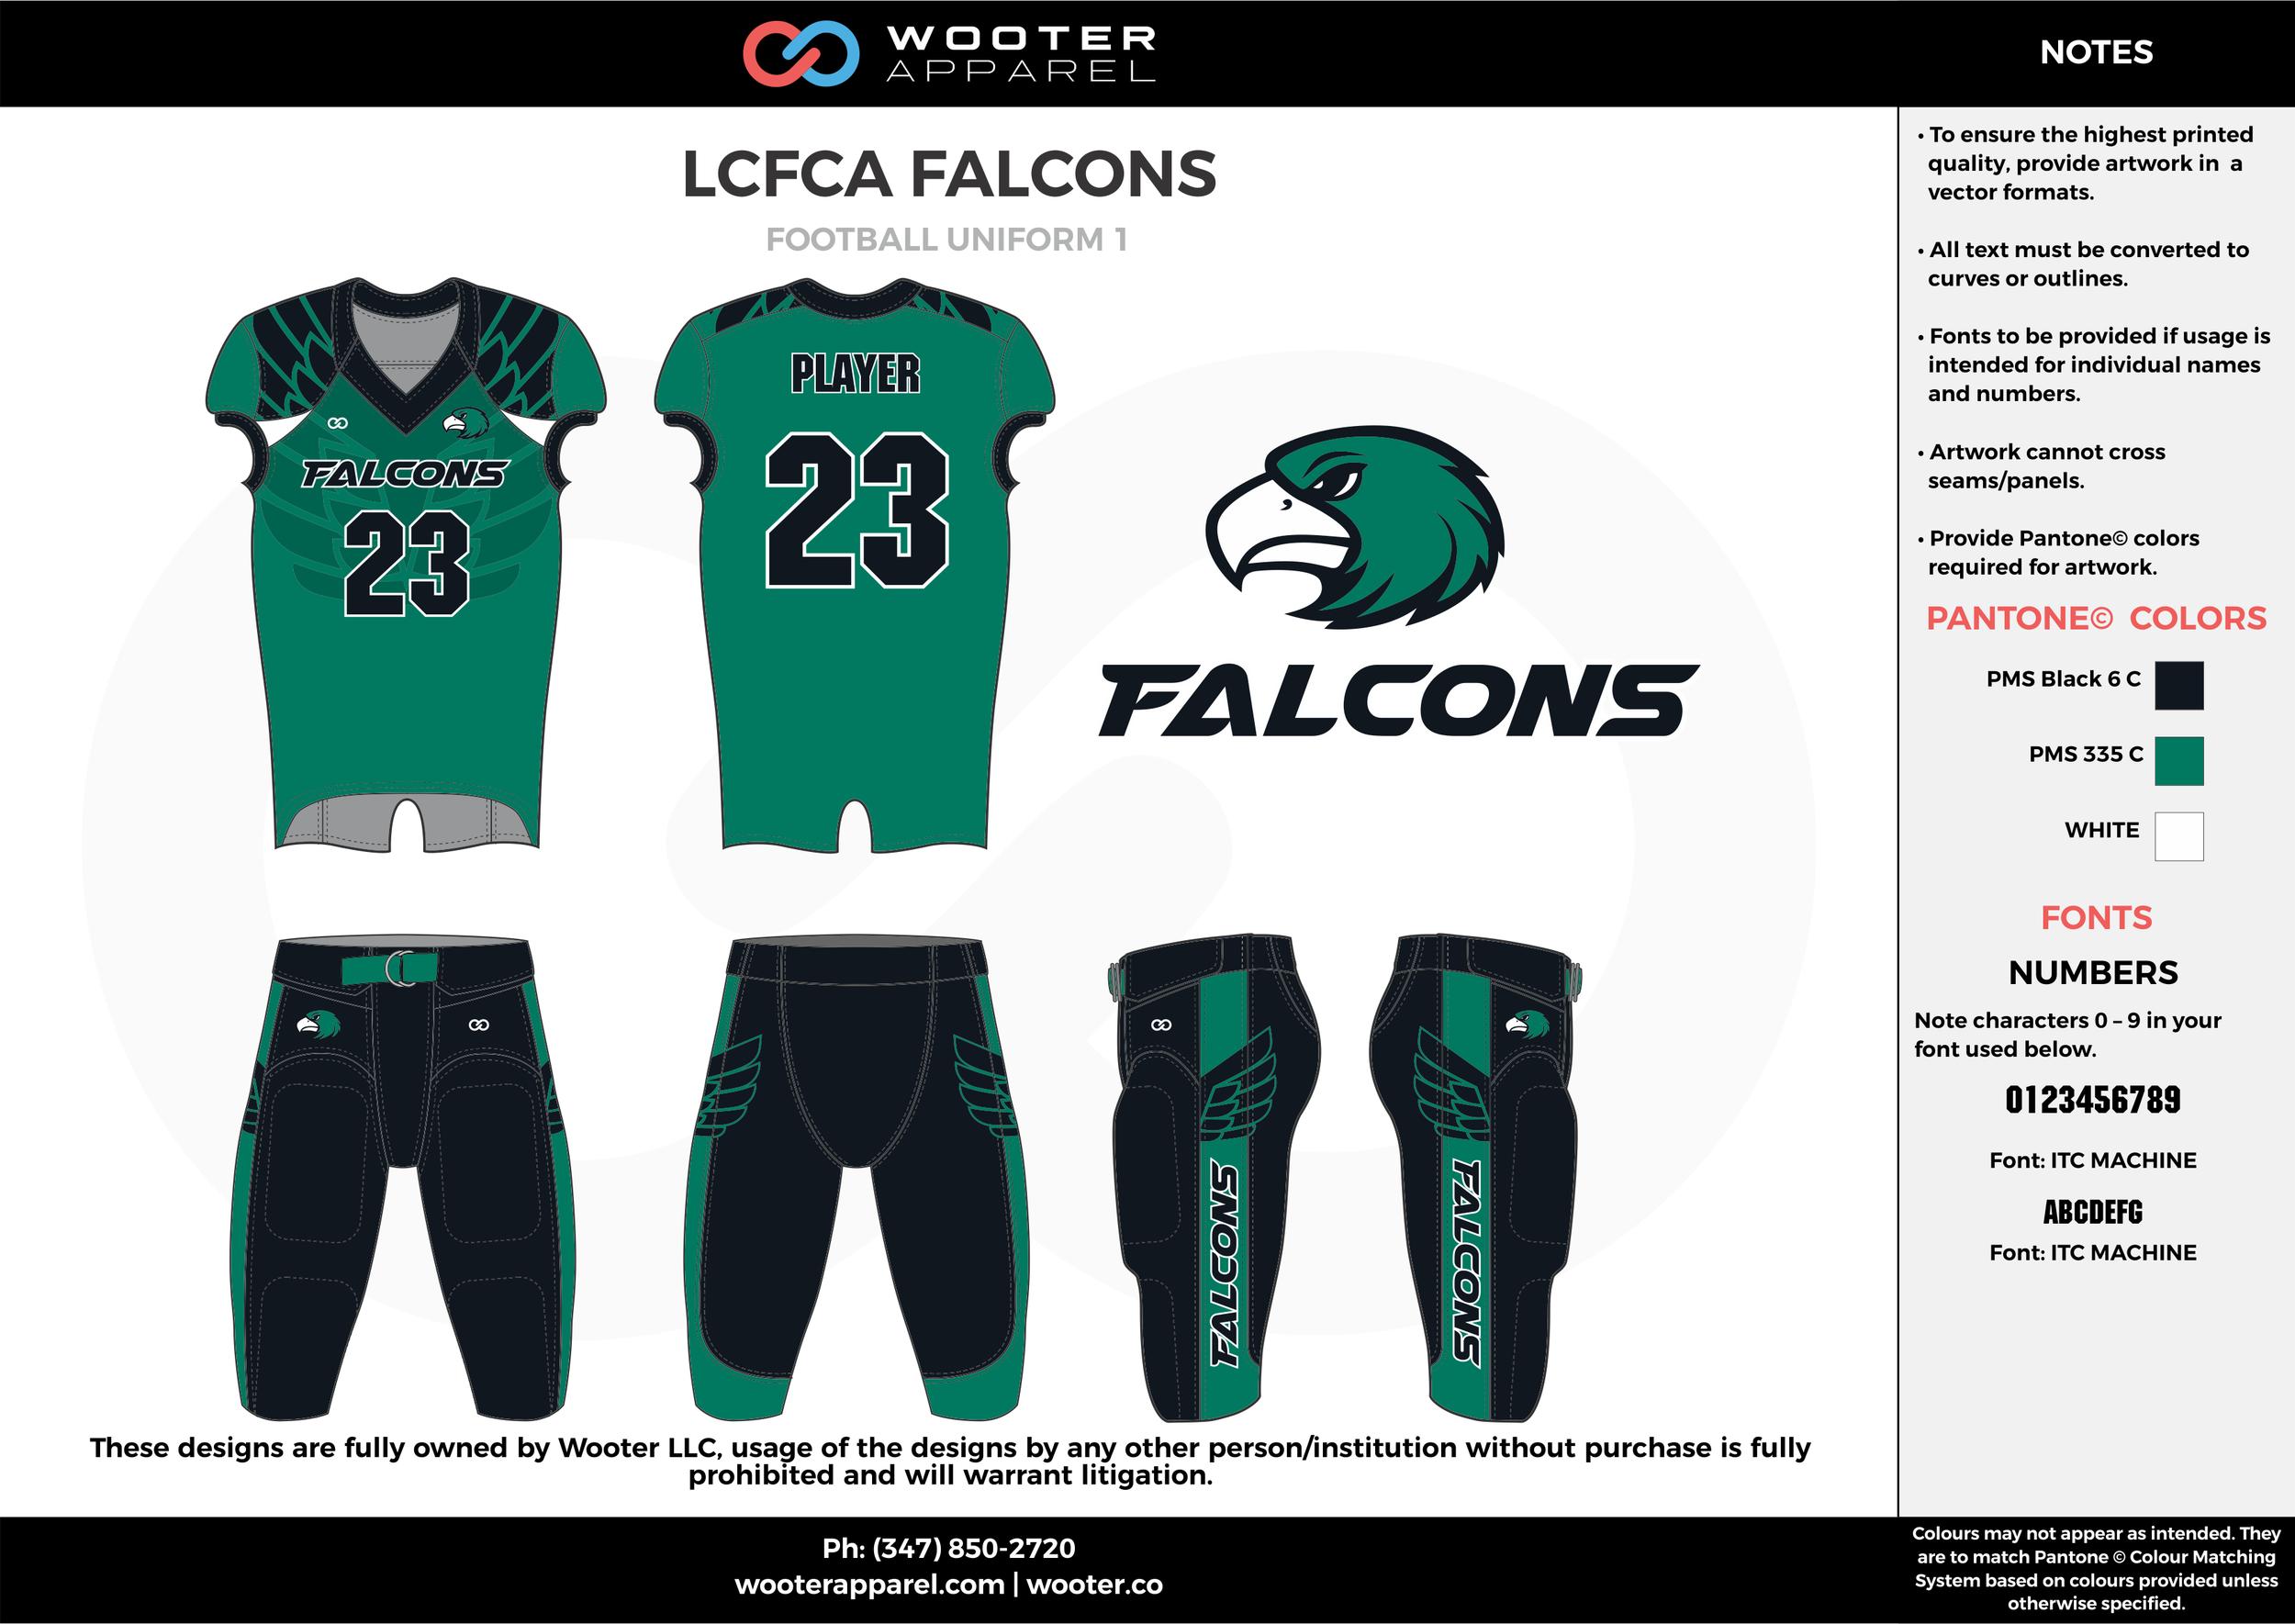 LCFCA FALCONS green black white football uniforms jerseys pants